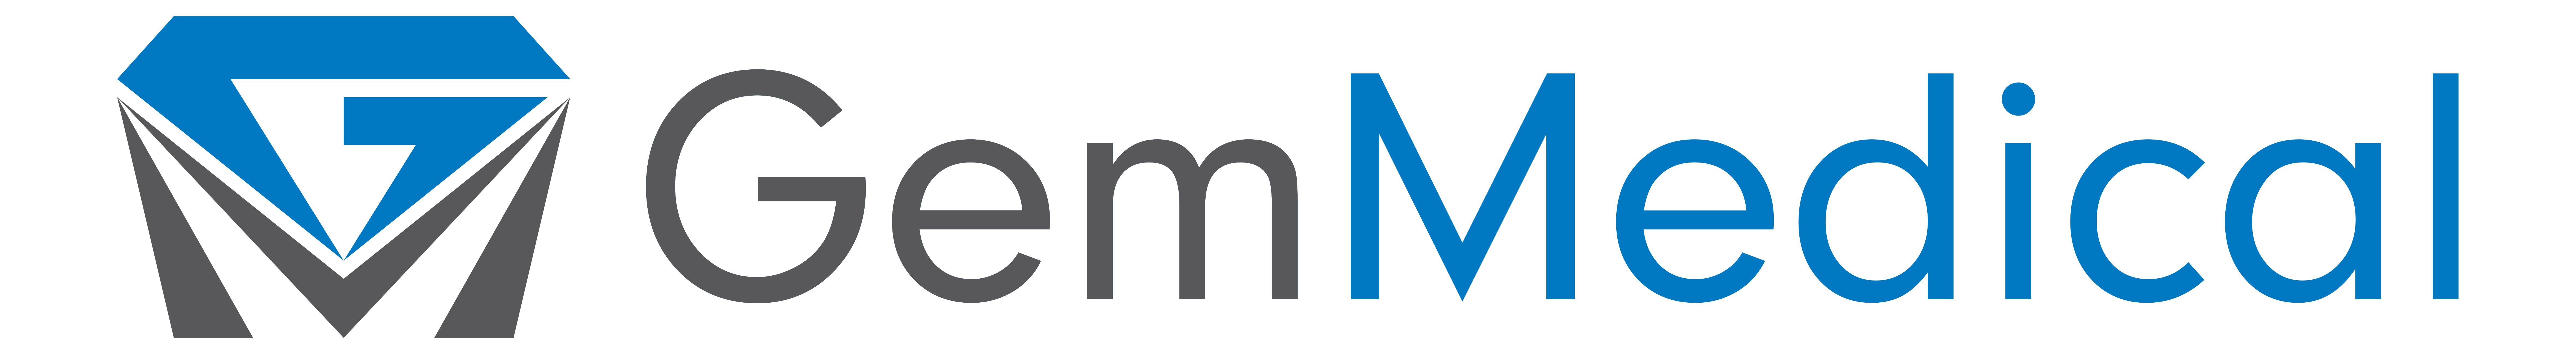 logo brand gemmedical